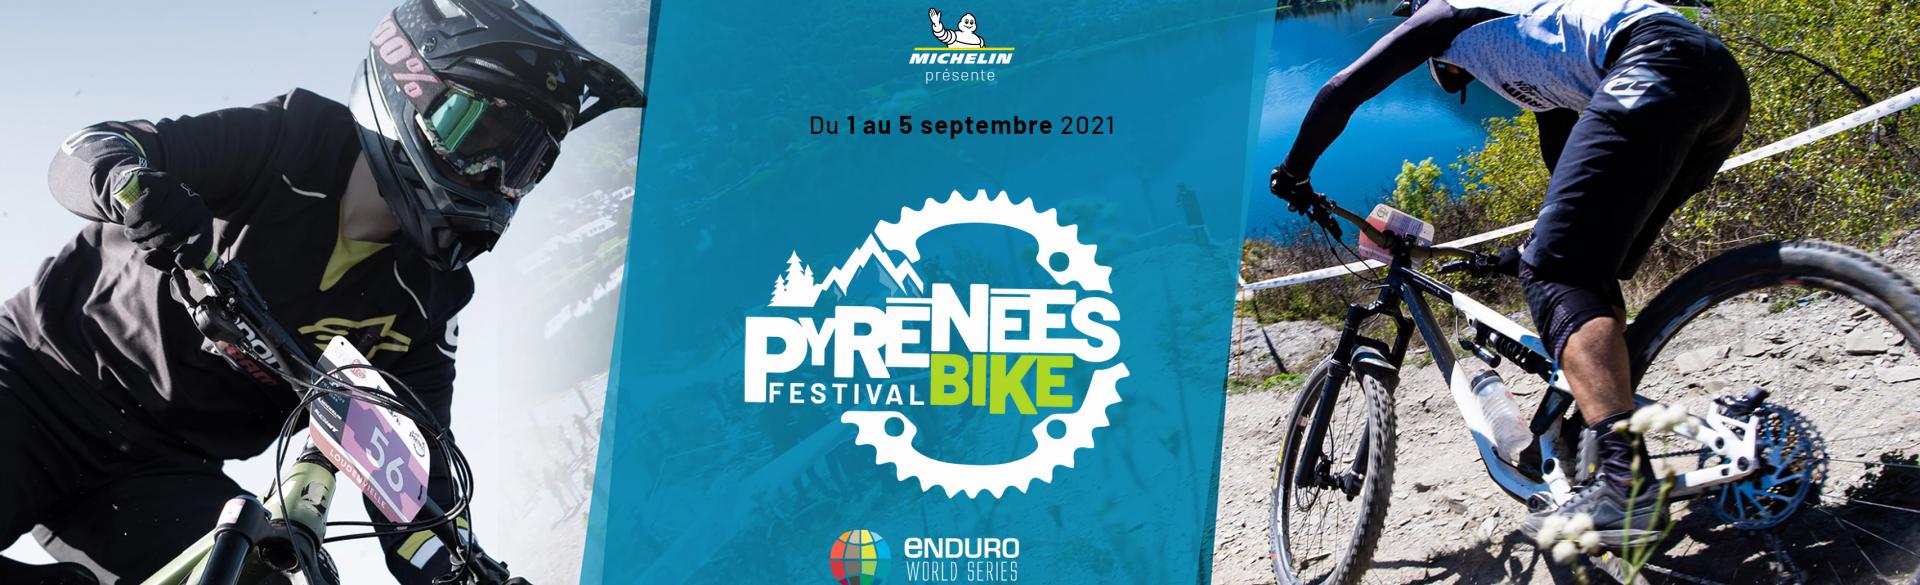 Pyreneesbikefestival 2021